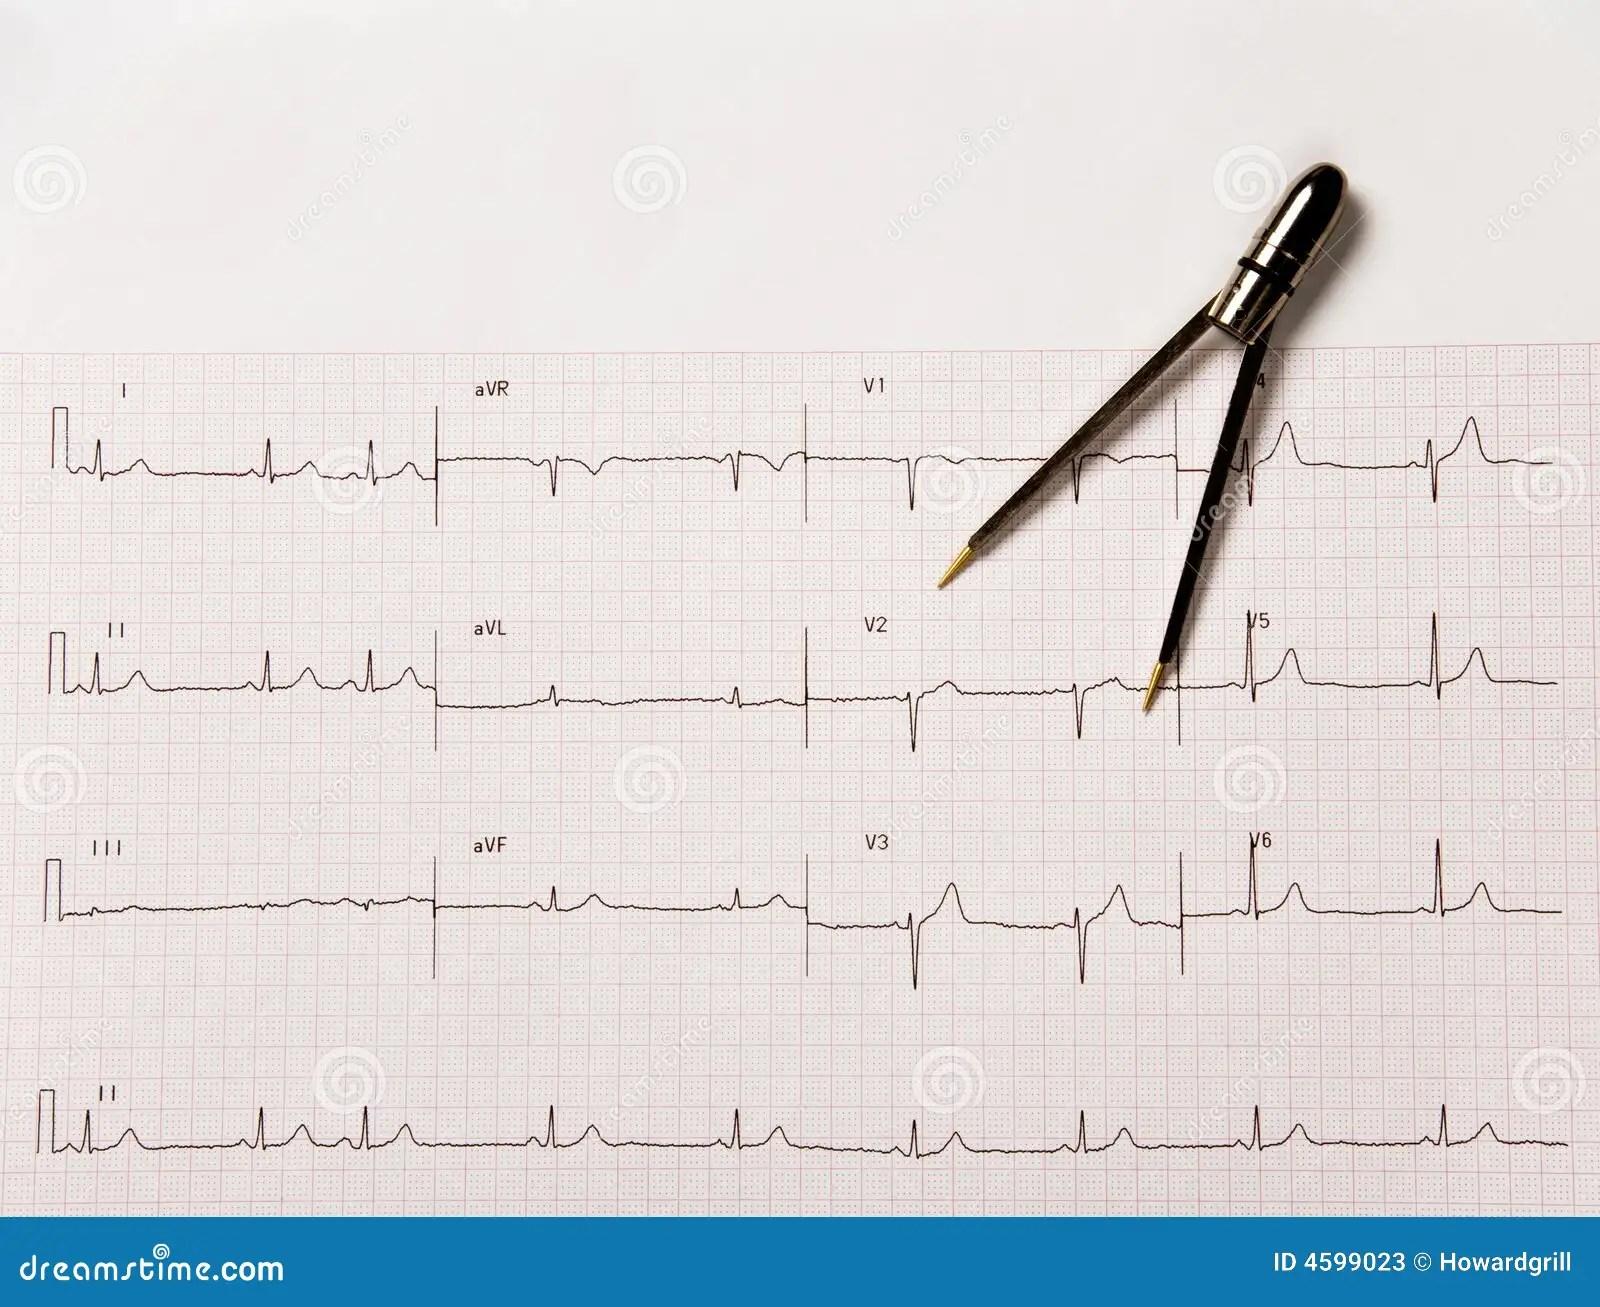 Electrocardiogram Or Ekg With Calipers Stock Image